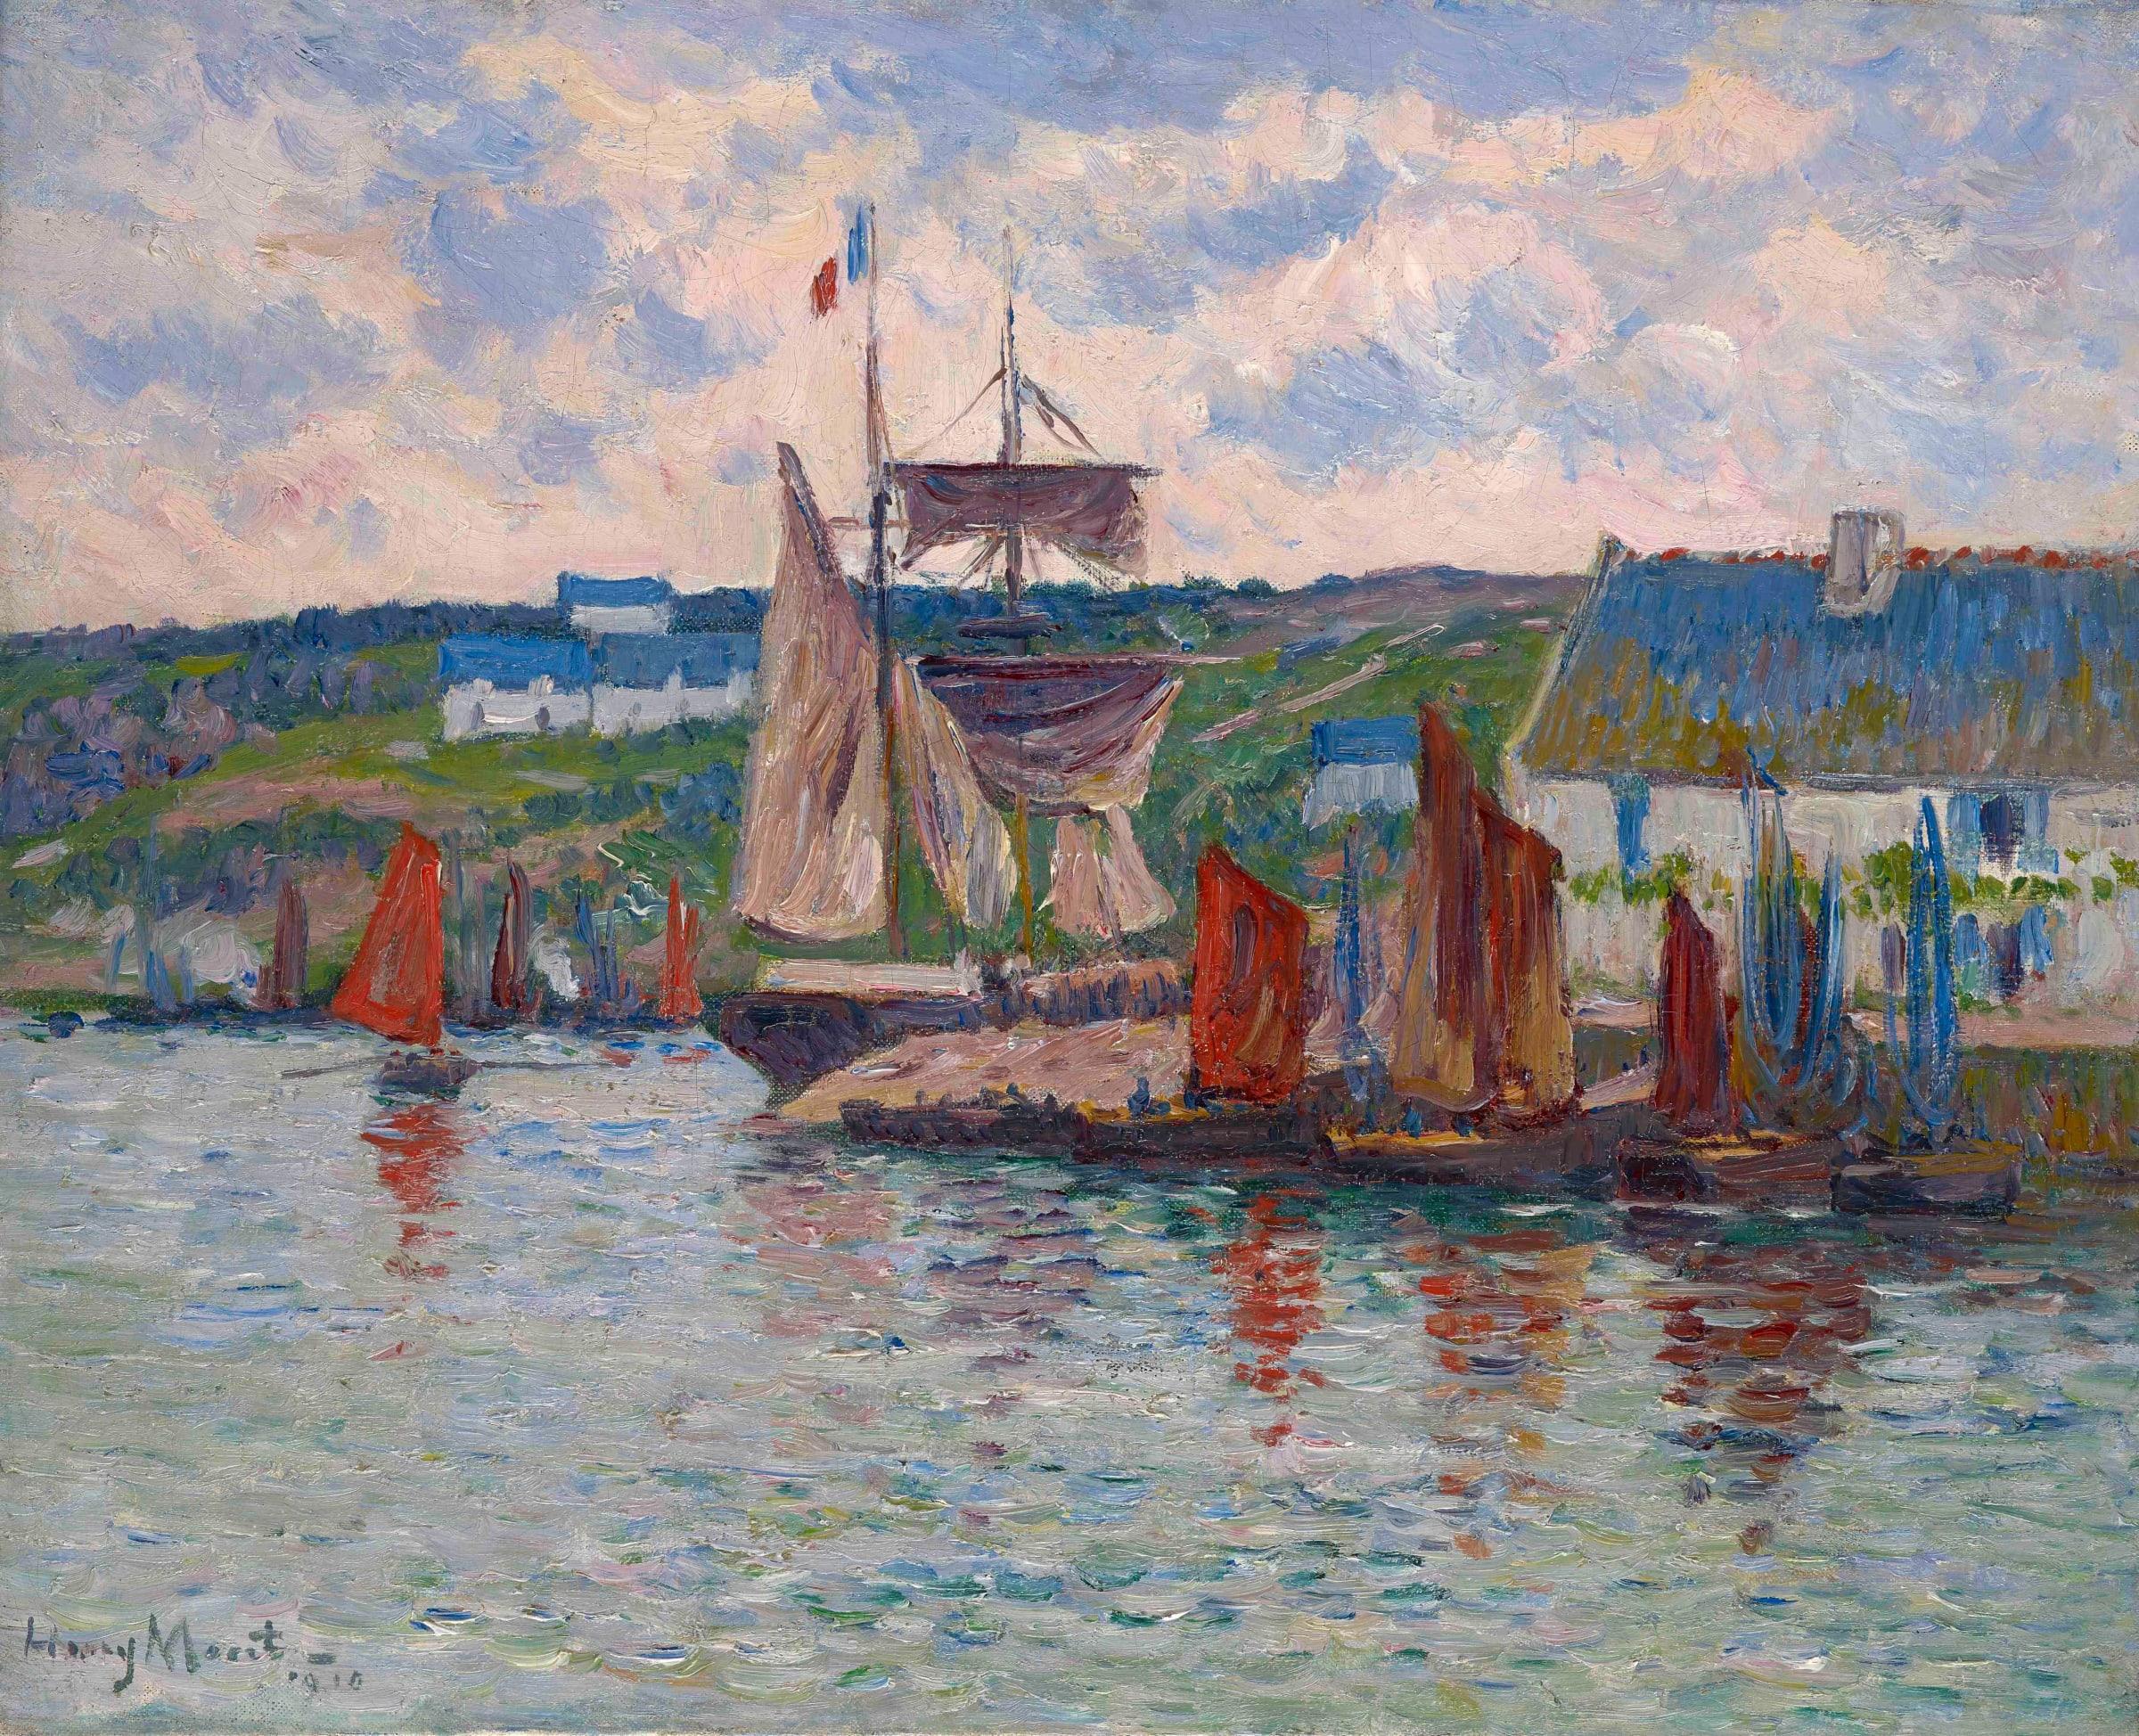 "<span class=""link fancybox-details-link""><a href=""/artists/69-henry-moret/works/9413-henry-moret-port-en-bretagne-1910/"">View Detail Page</a></span><div class=""artist""><span class=""artist""><strong>Henry Moret</strong></span></div><div class=""title""><em>Port en Bretagne</em>, 1910</div><div class=""signed_and_dated"">Signed and dated lower left Henry Moret 1910</div><div class=""medium"">Oil on canvas</div><div class=""dimensions"">33.1 x 40.5 cm<br /> 13 x 15 15/16 inches</div>"